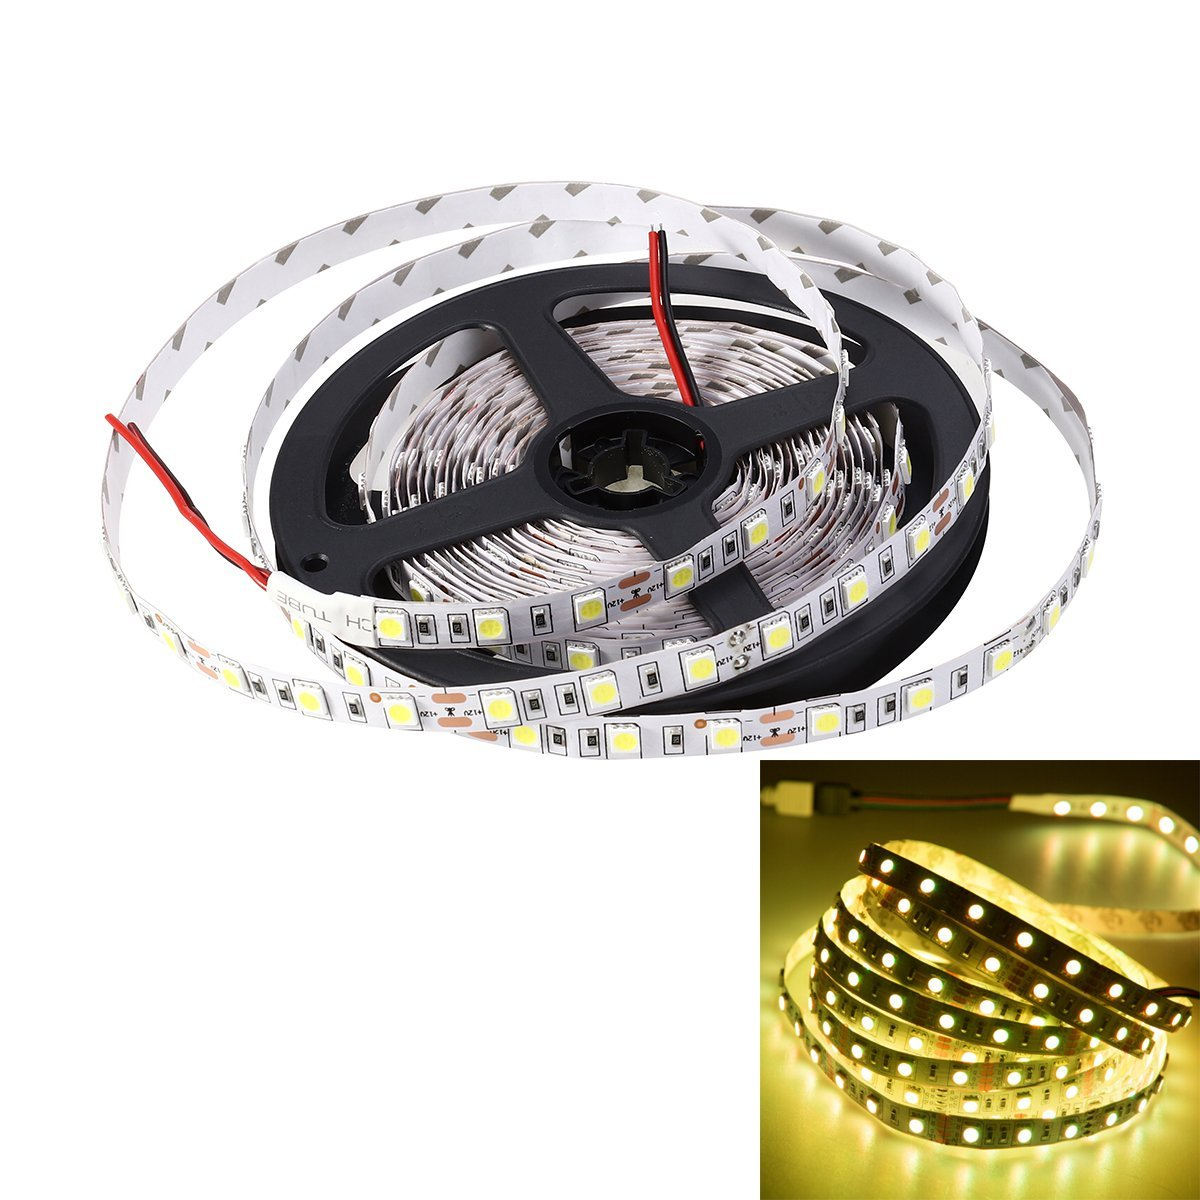 LEDMOMO 5M (16.4ft) Non-Waterproof Flexible DC 24V 300 SMD 5050 LED Strip Lights Lamp Outdoor Indoor(Yellow Light)